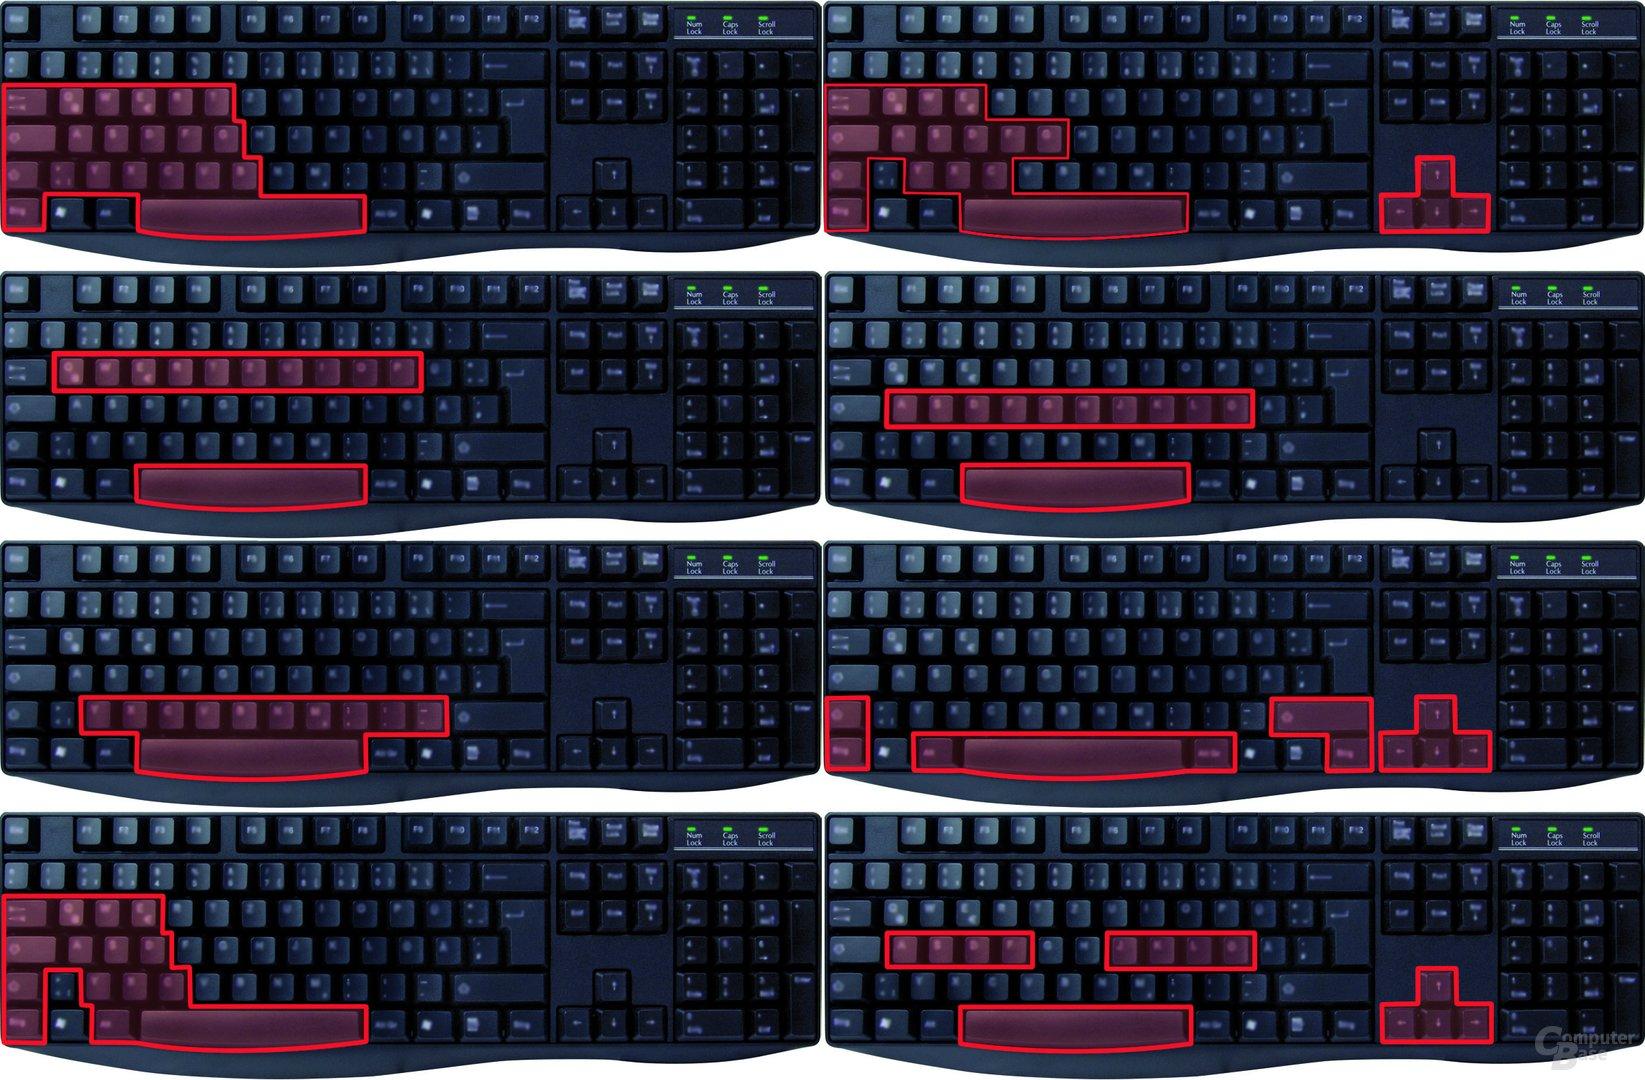 Anti-Ghosting-Tastenbelegungen der KeySonic KSK-8003 UX